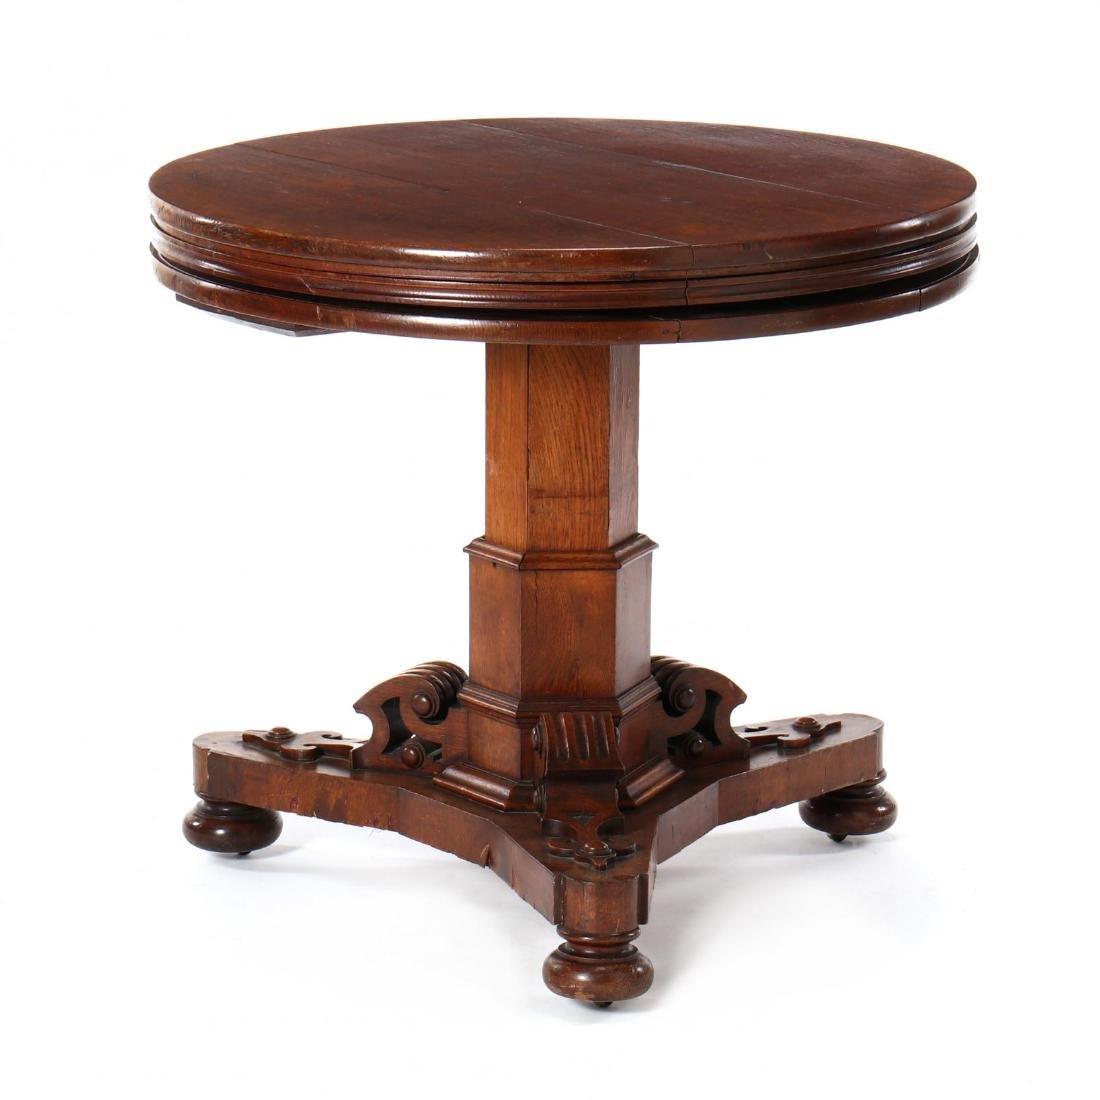 Edwardian Oak Metamorphic Tiered Serving Table - 3